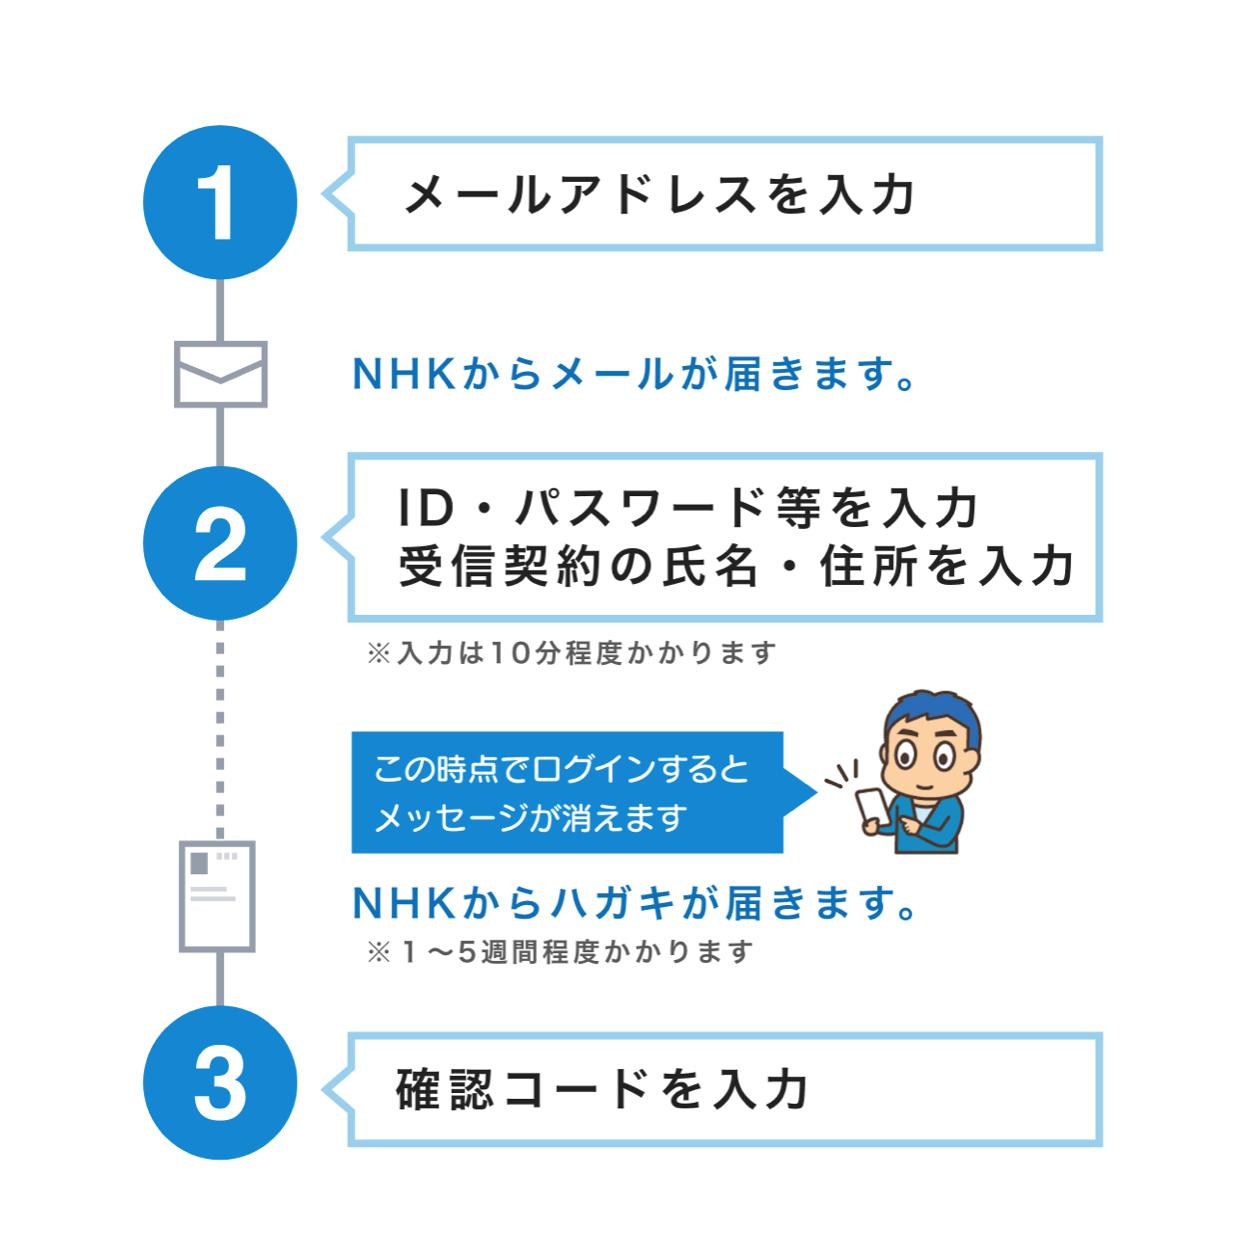 NHKプラスの登録の流れ